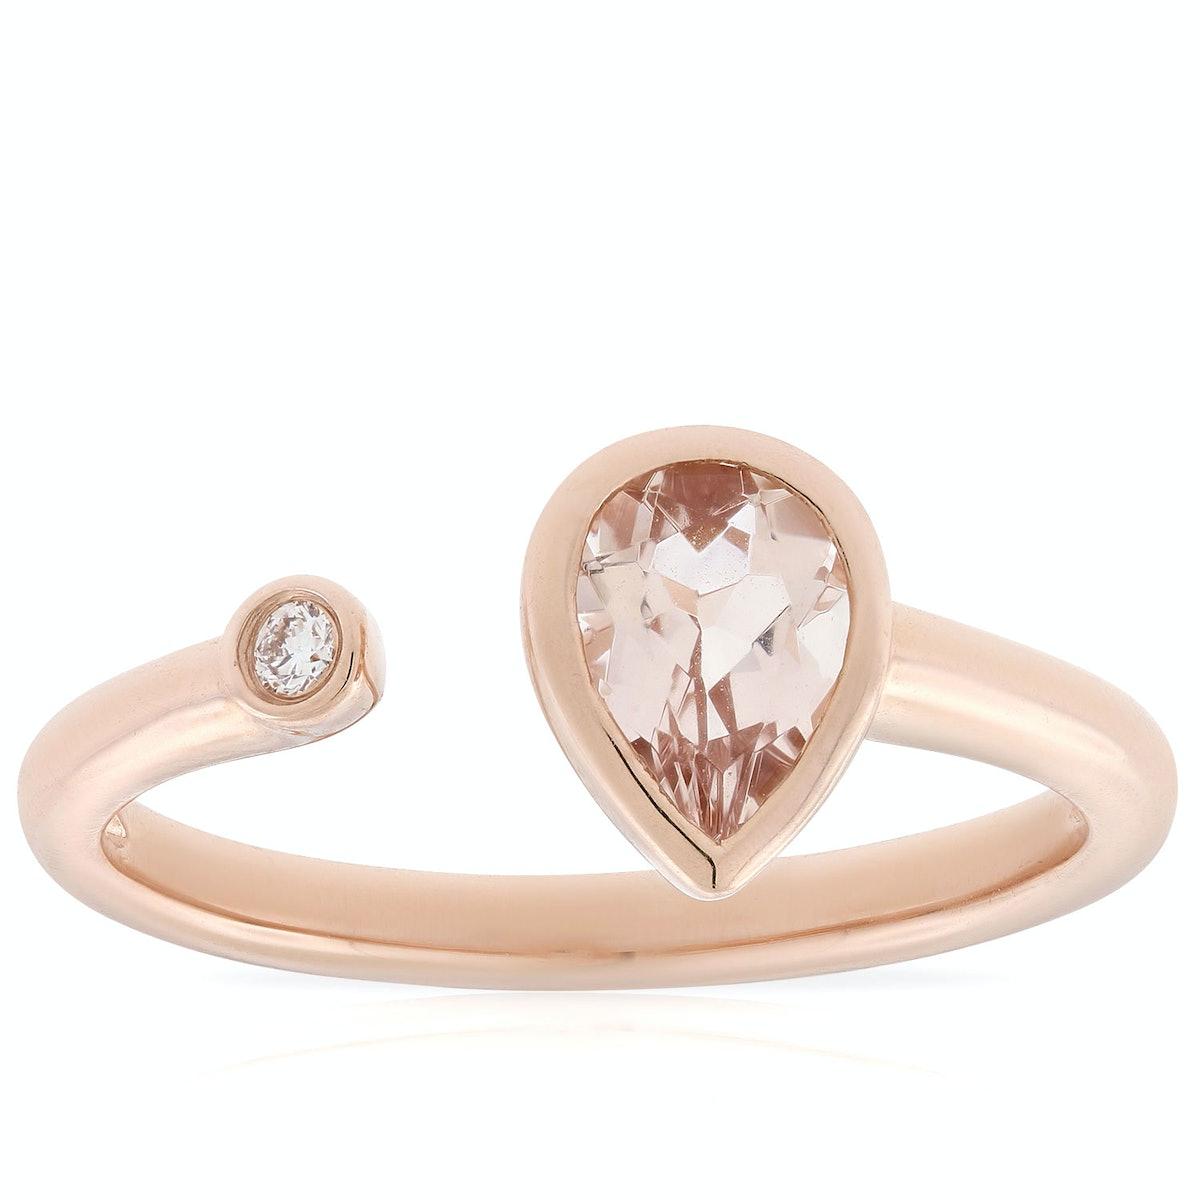 Morganite & Diamond Open Shank Ring in 14K Rose Gold